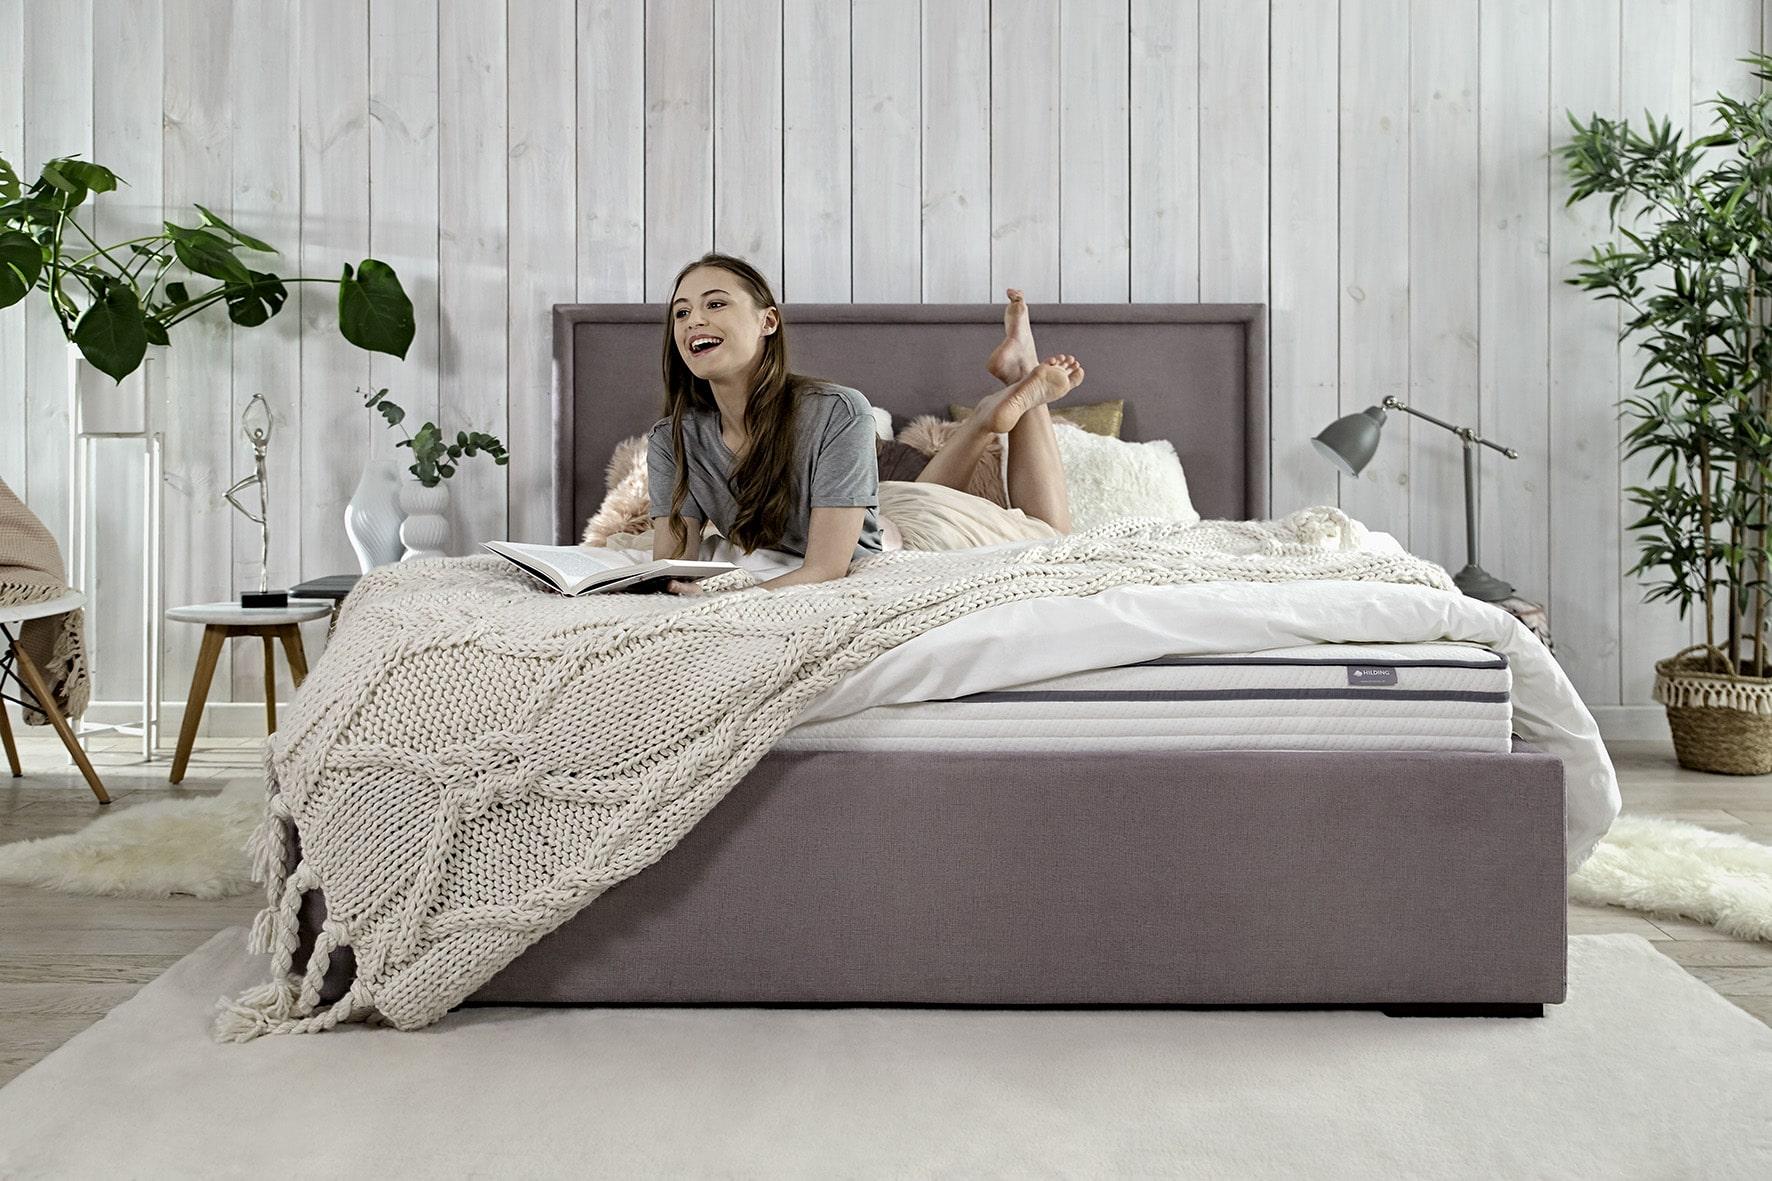 wybór materaca do spania